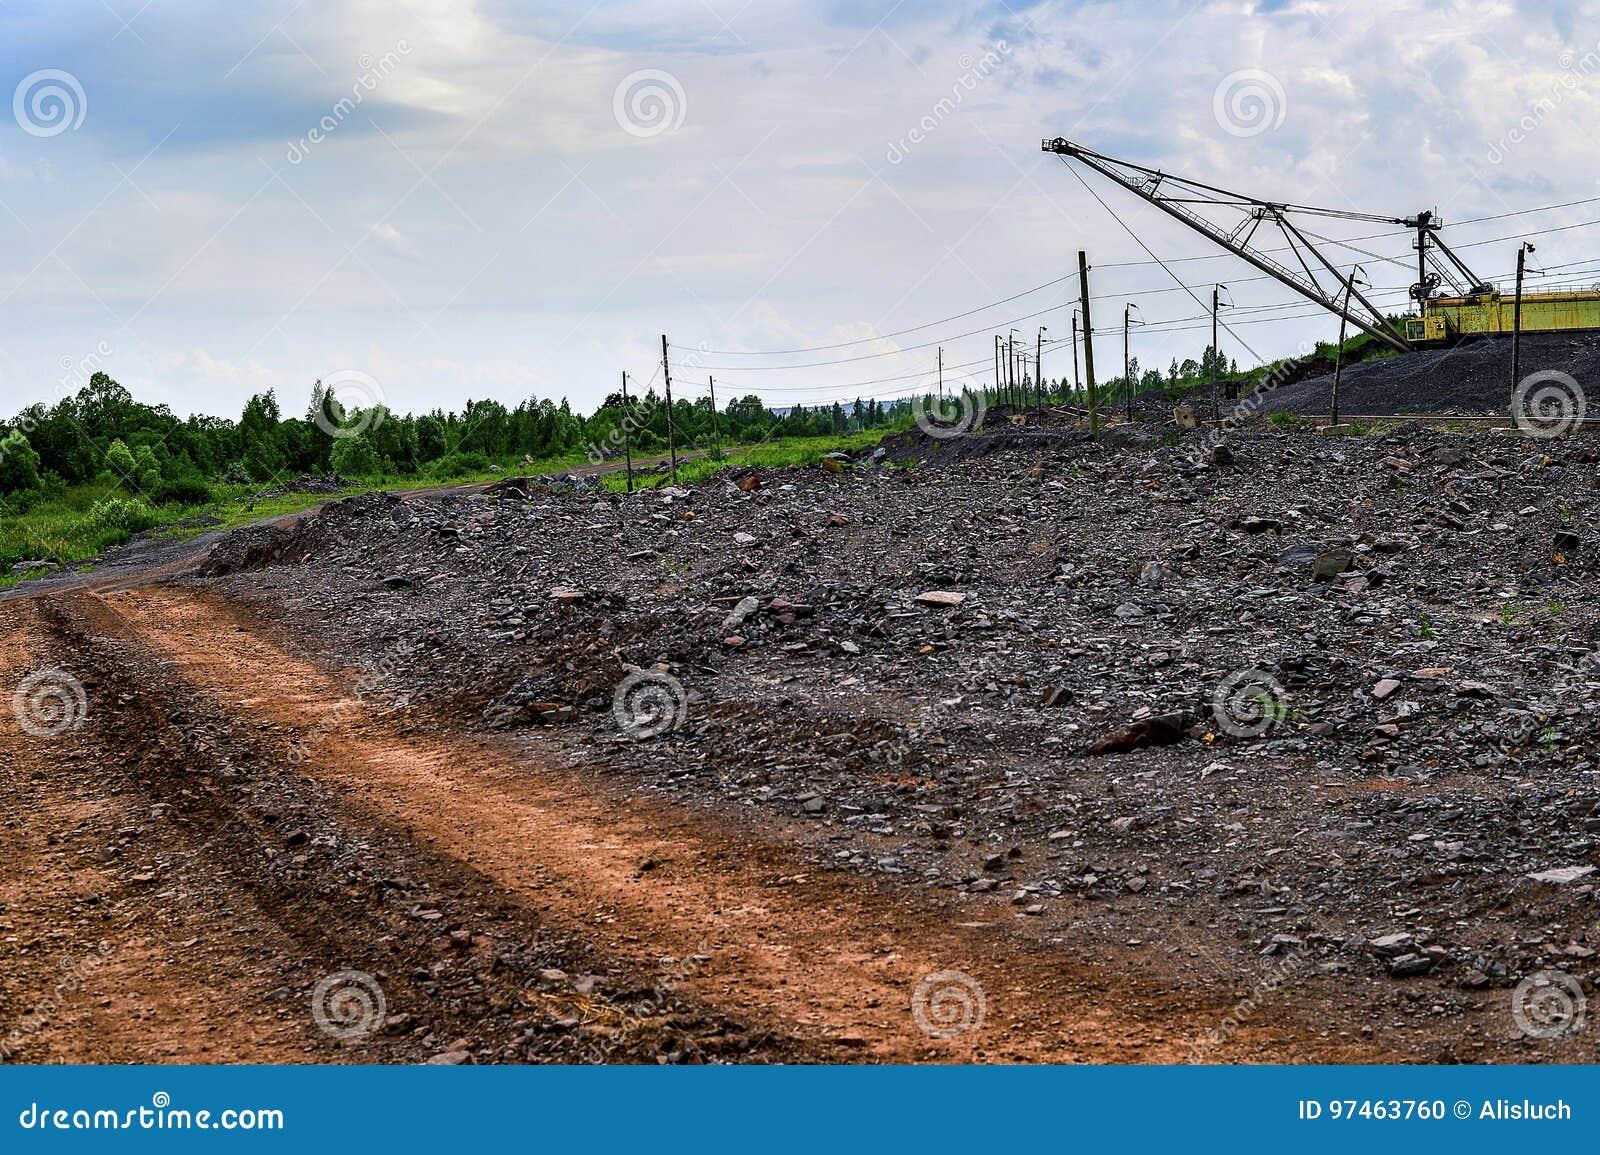 Excavator machine at excavation earthmoving work in quarry